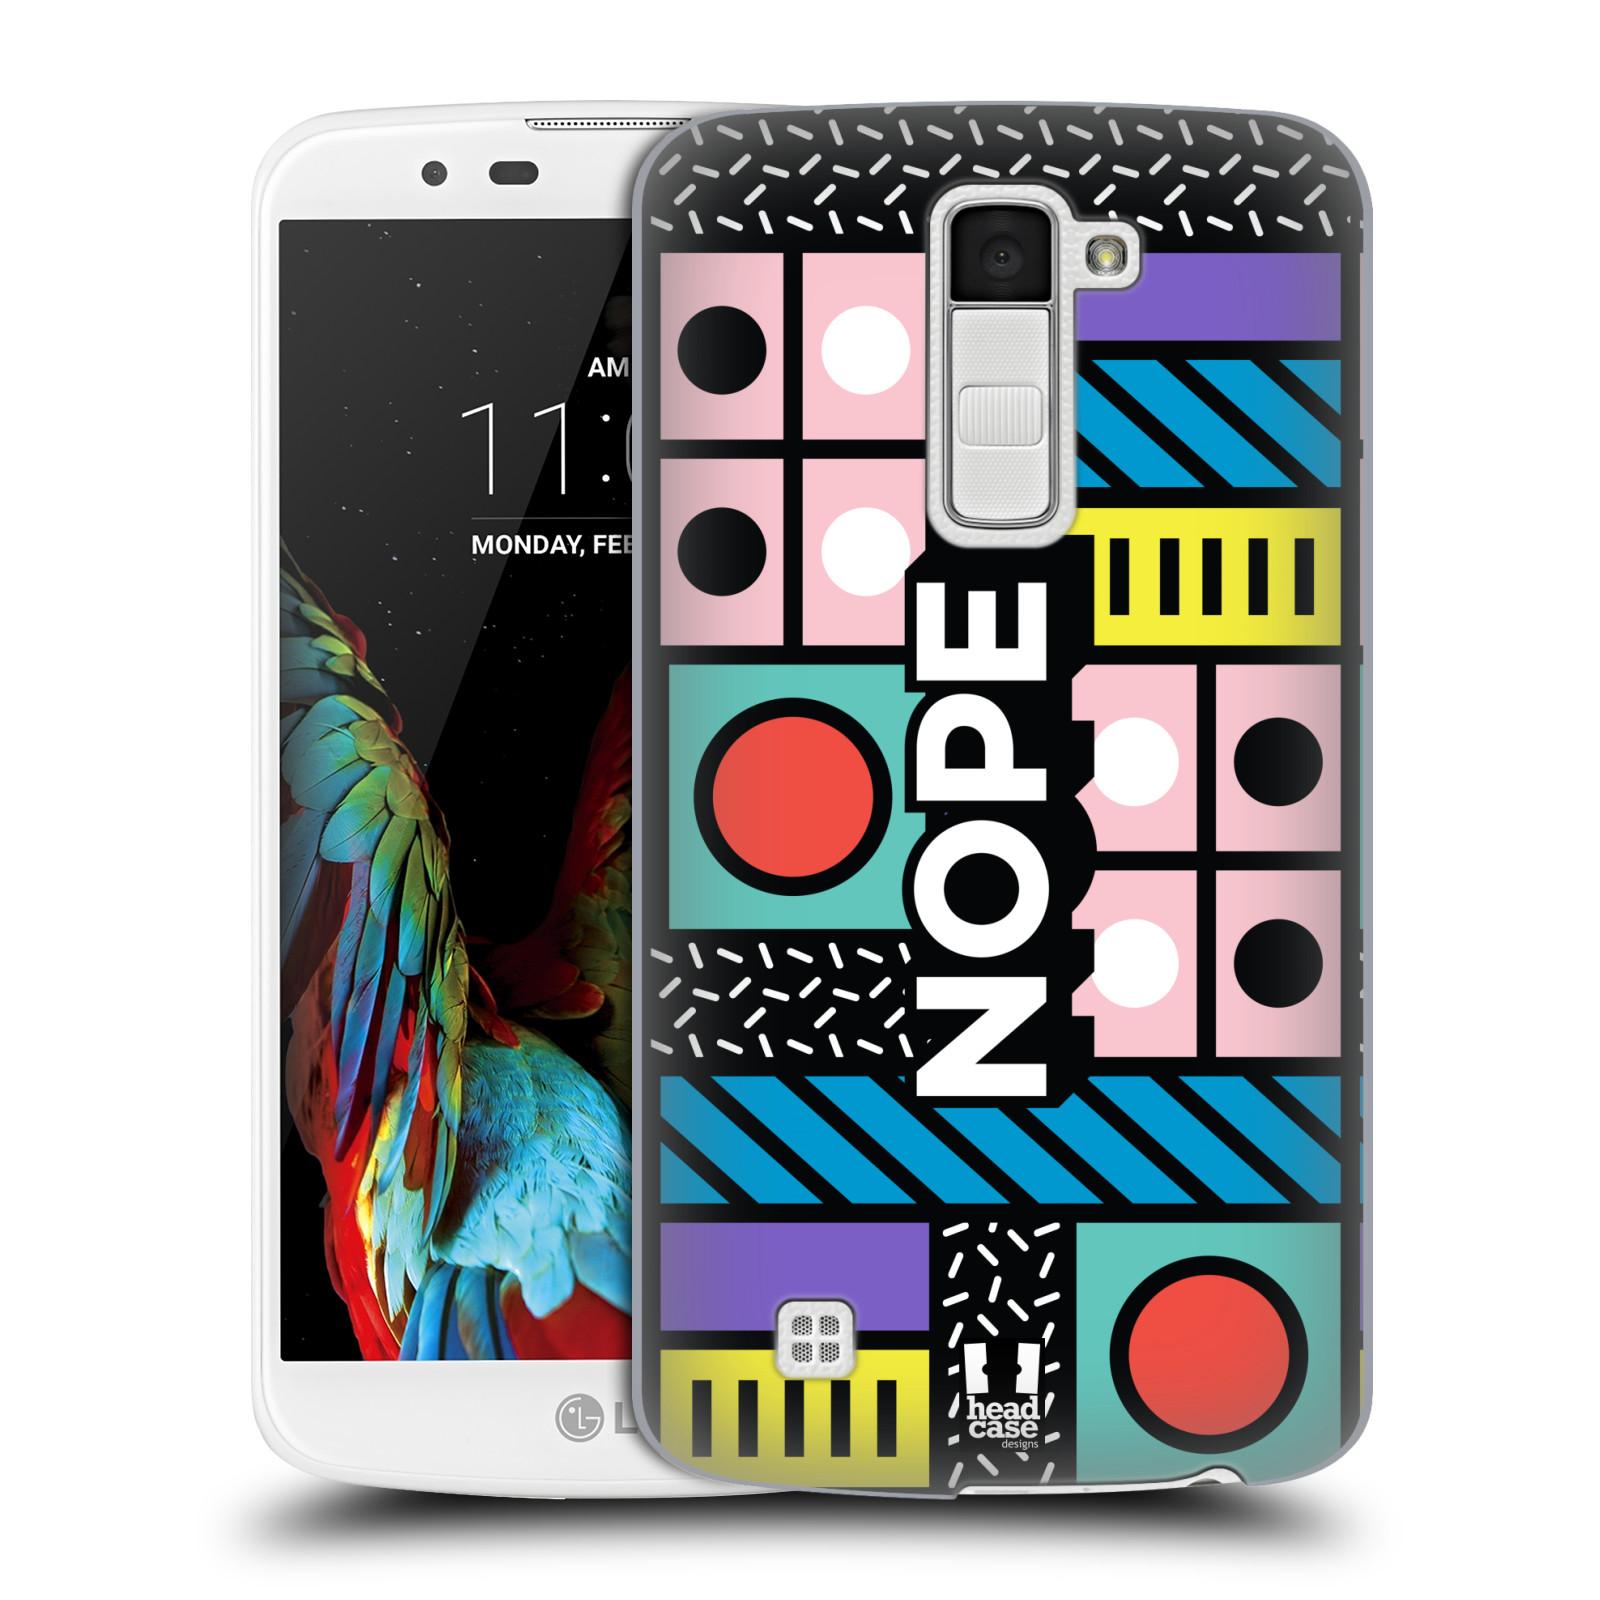 Head case designs pop deco hard back case for lg phones 3 for Pop deco